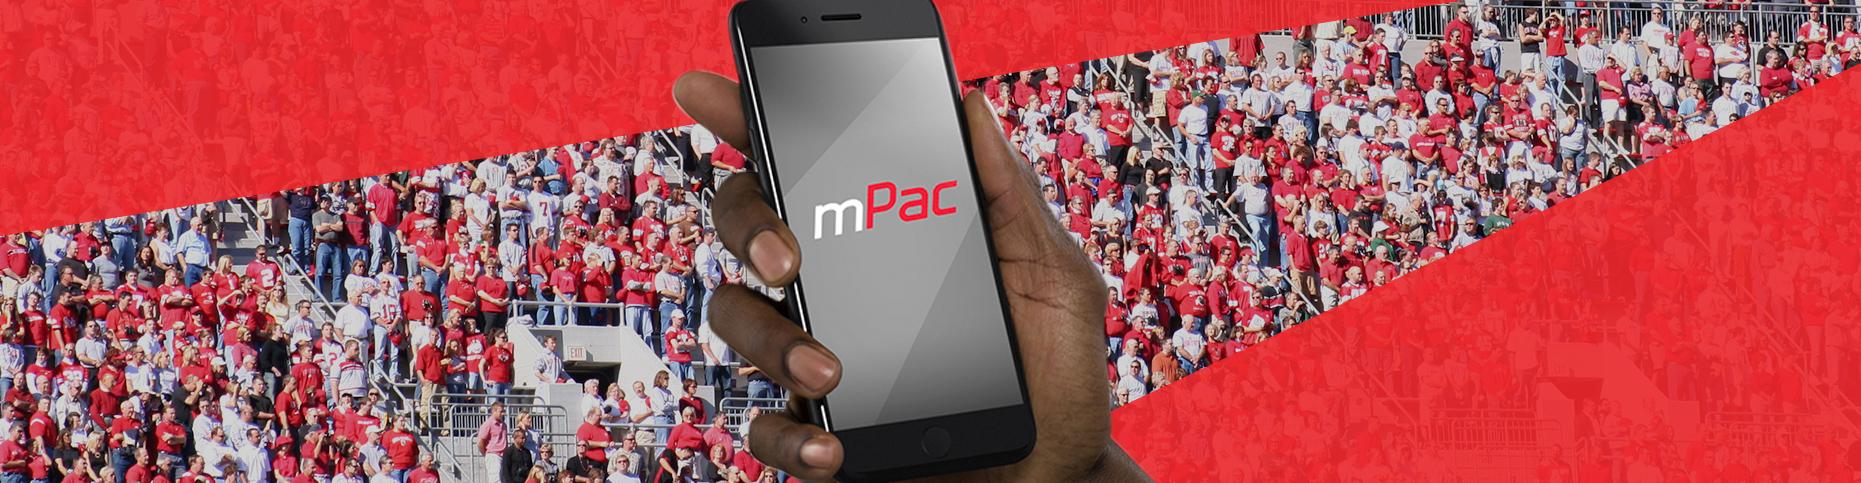 mPAC-Blog-Header.jpg